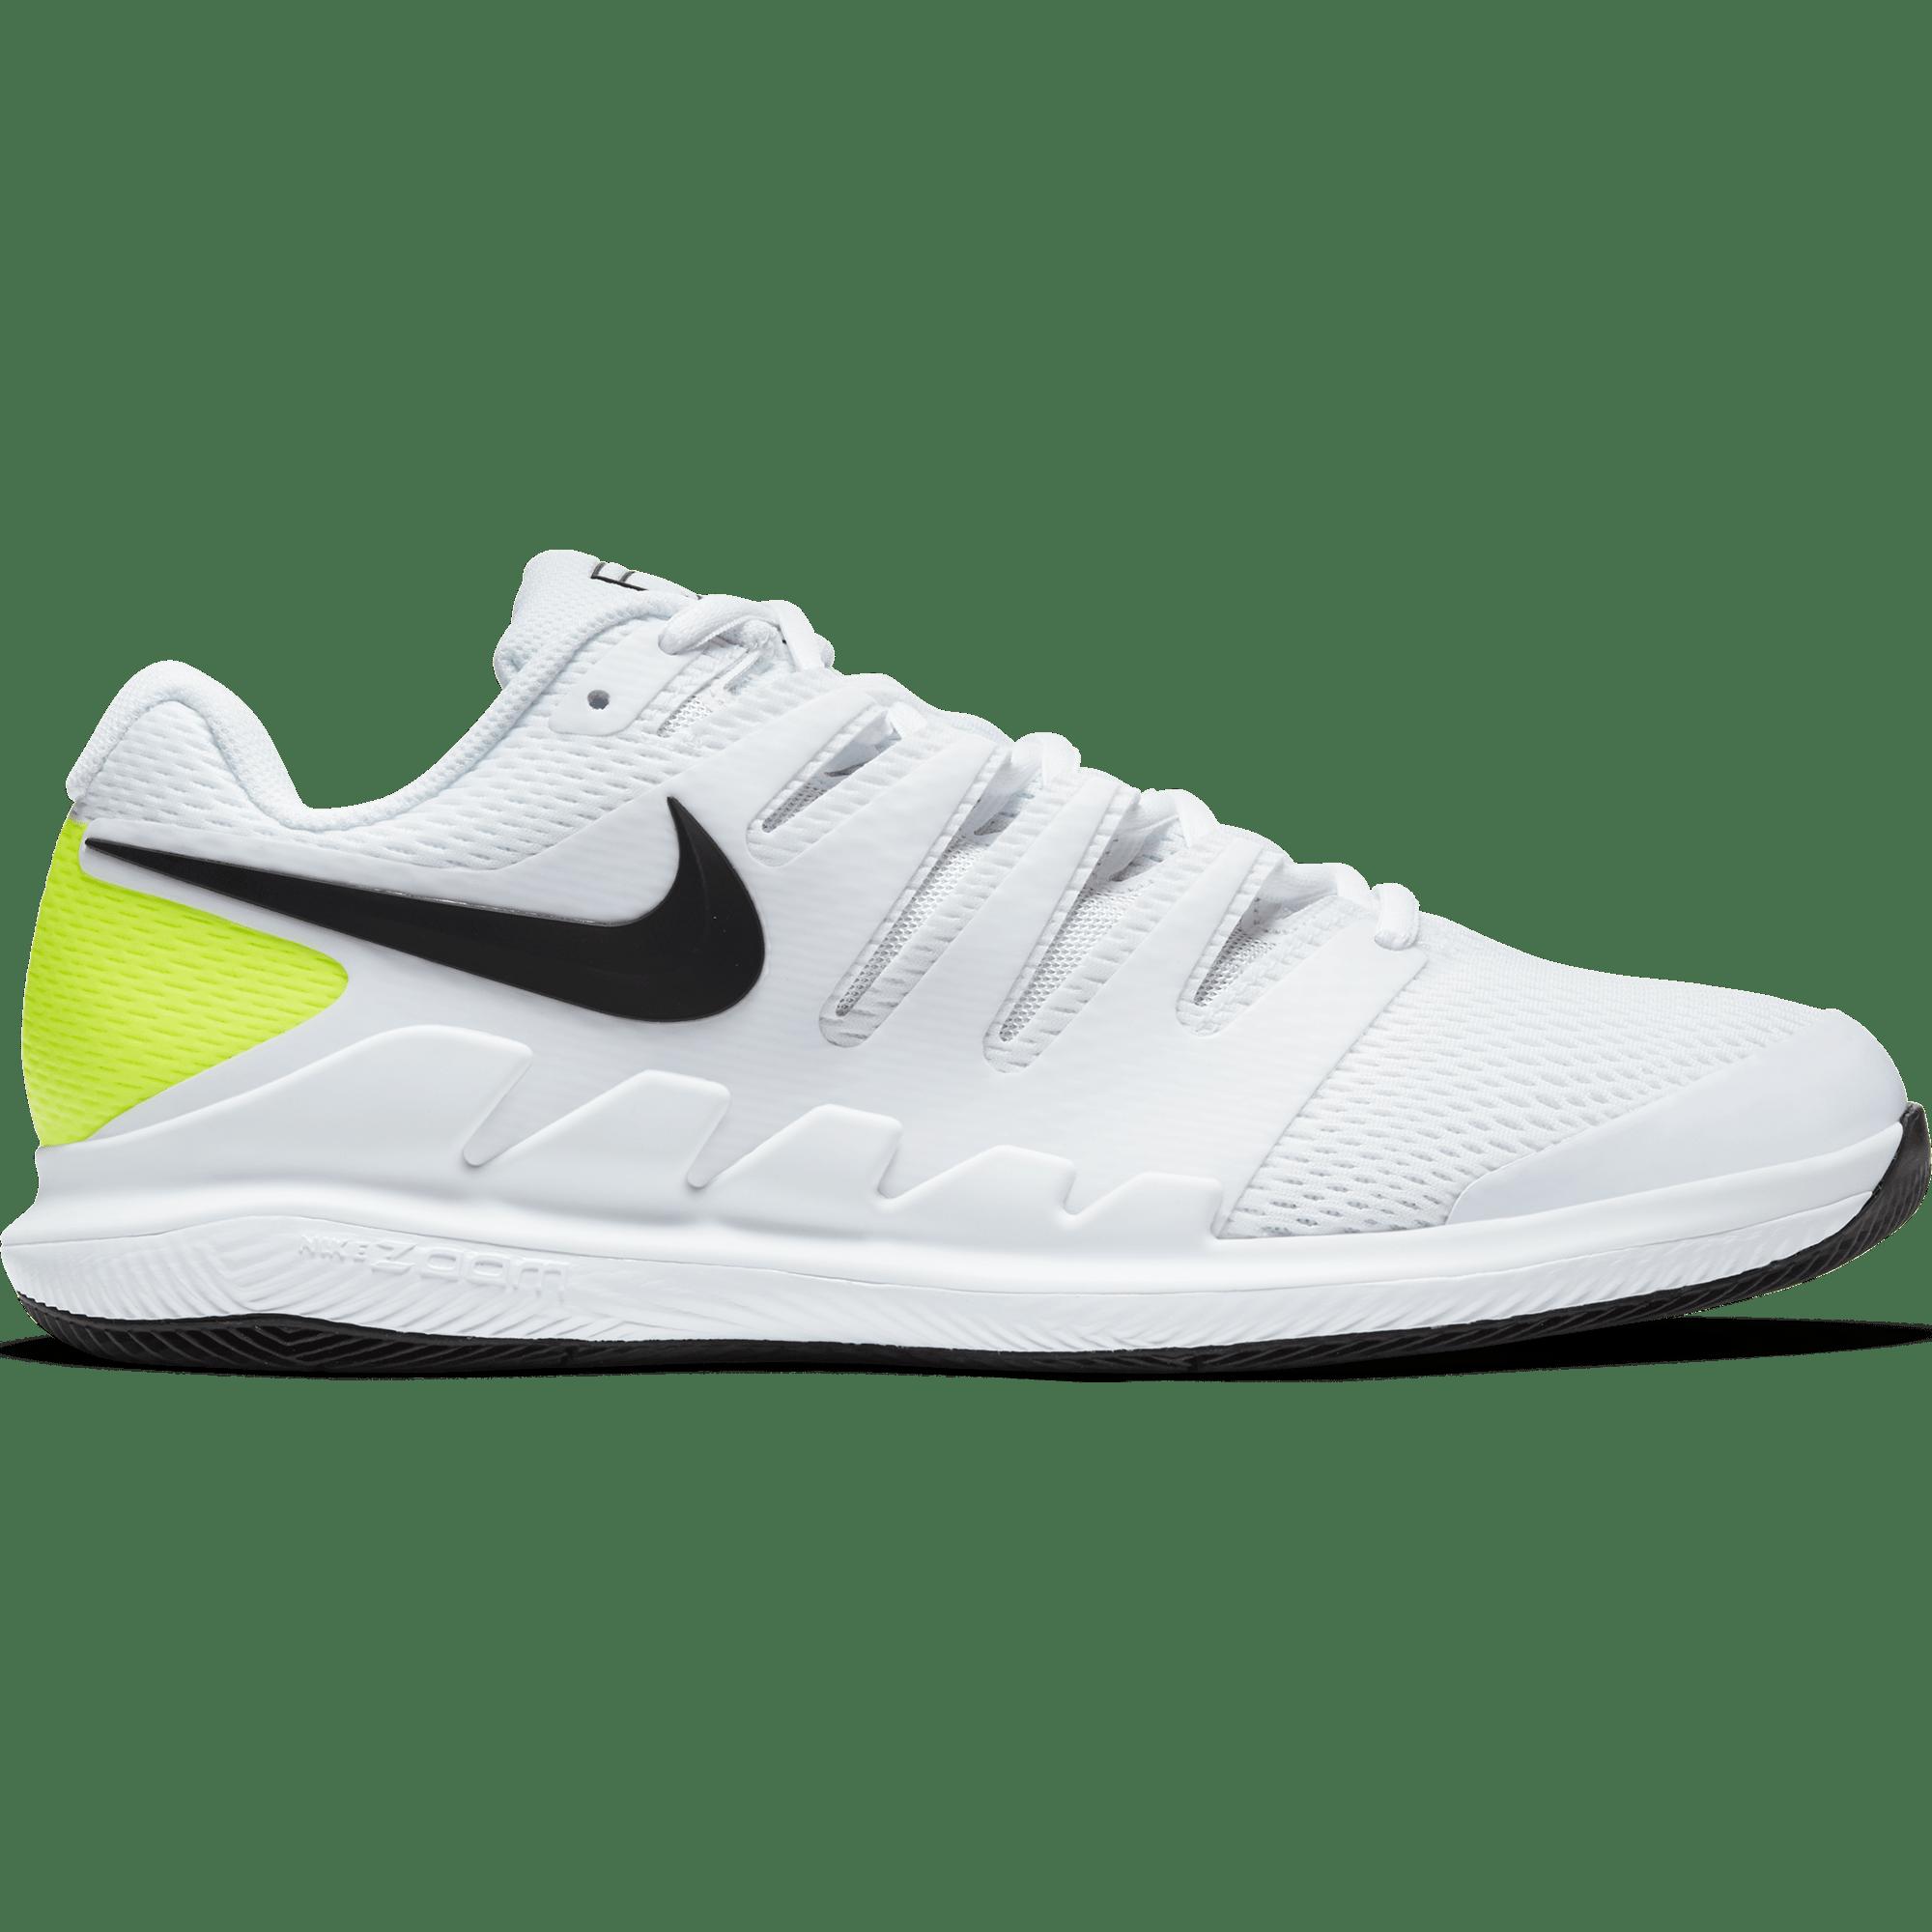 Clearance Tennis Shoes | PGA TOUR